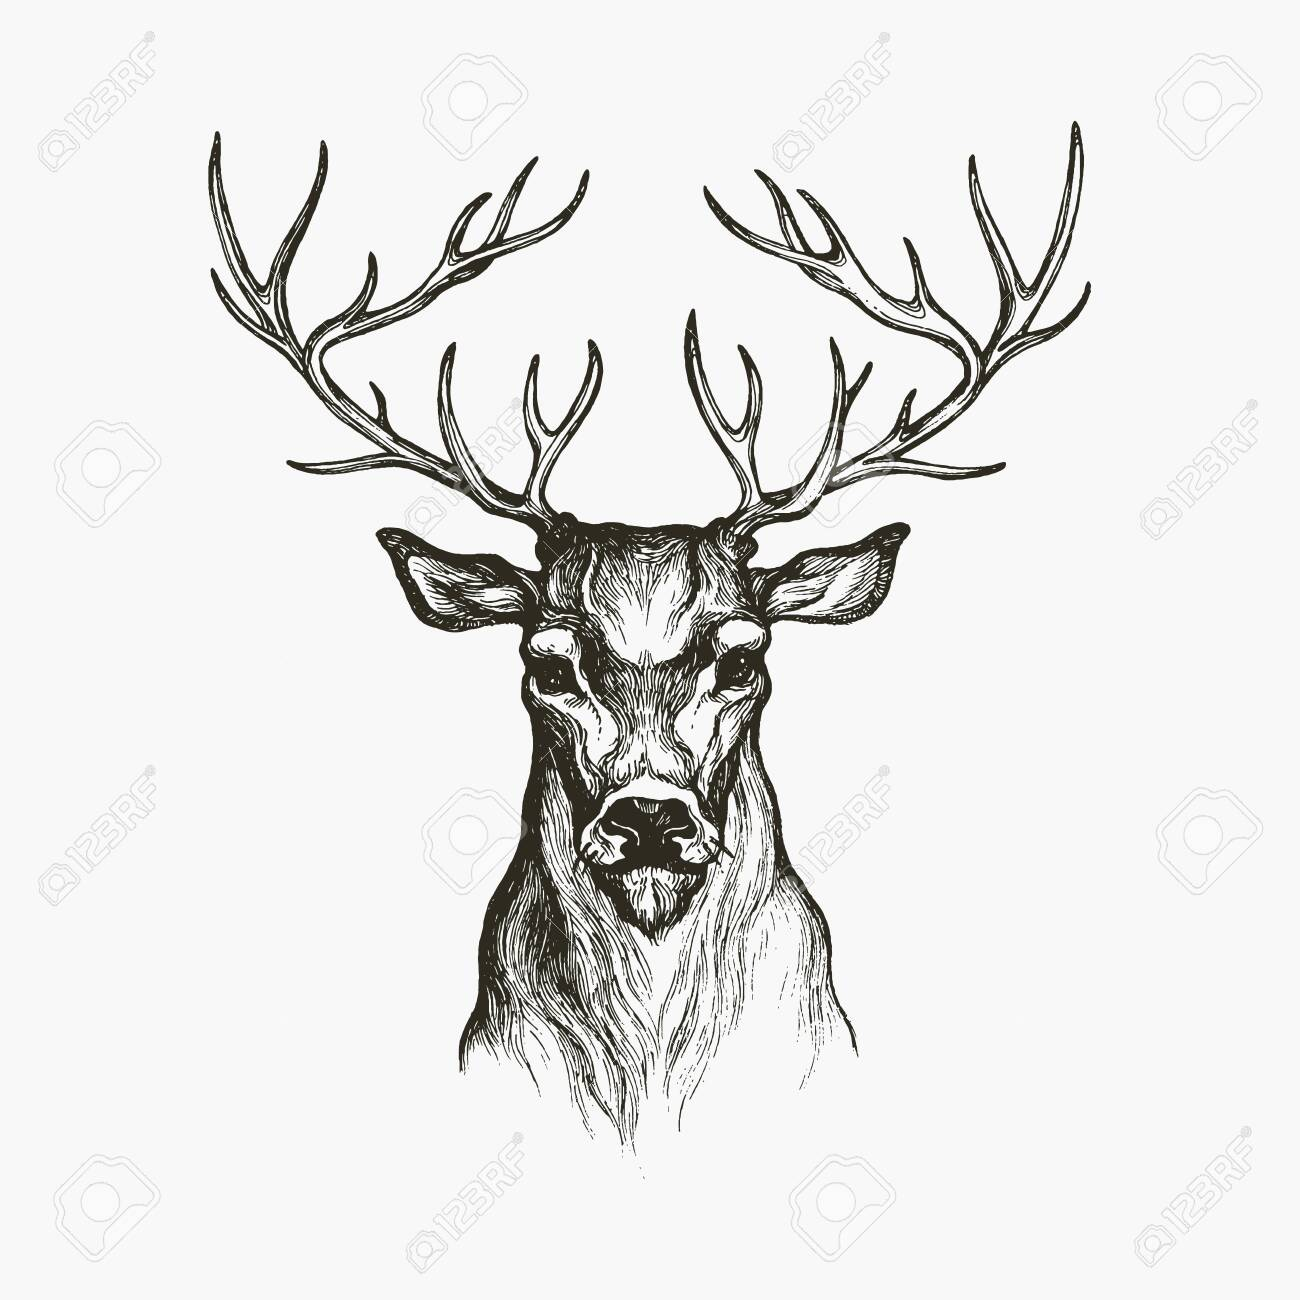 Hand Drawn Deer. Deer illustration. Hand drawn animal - 135478546